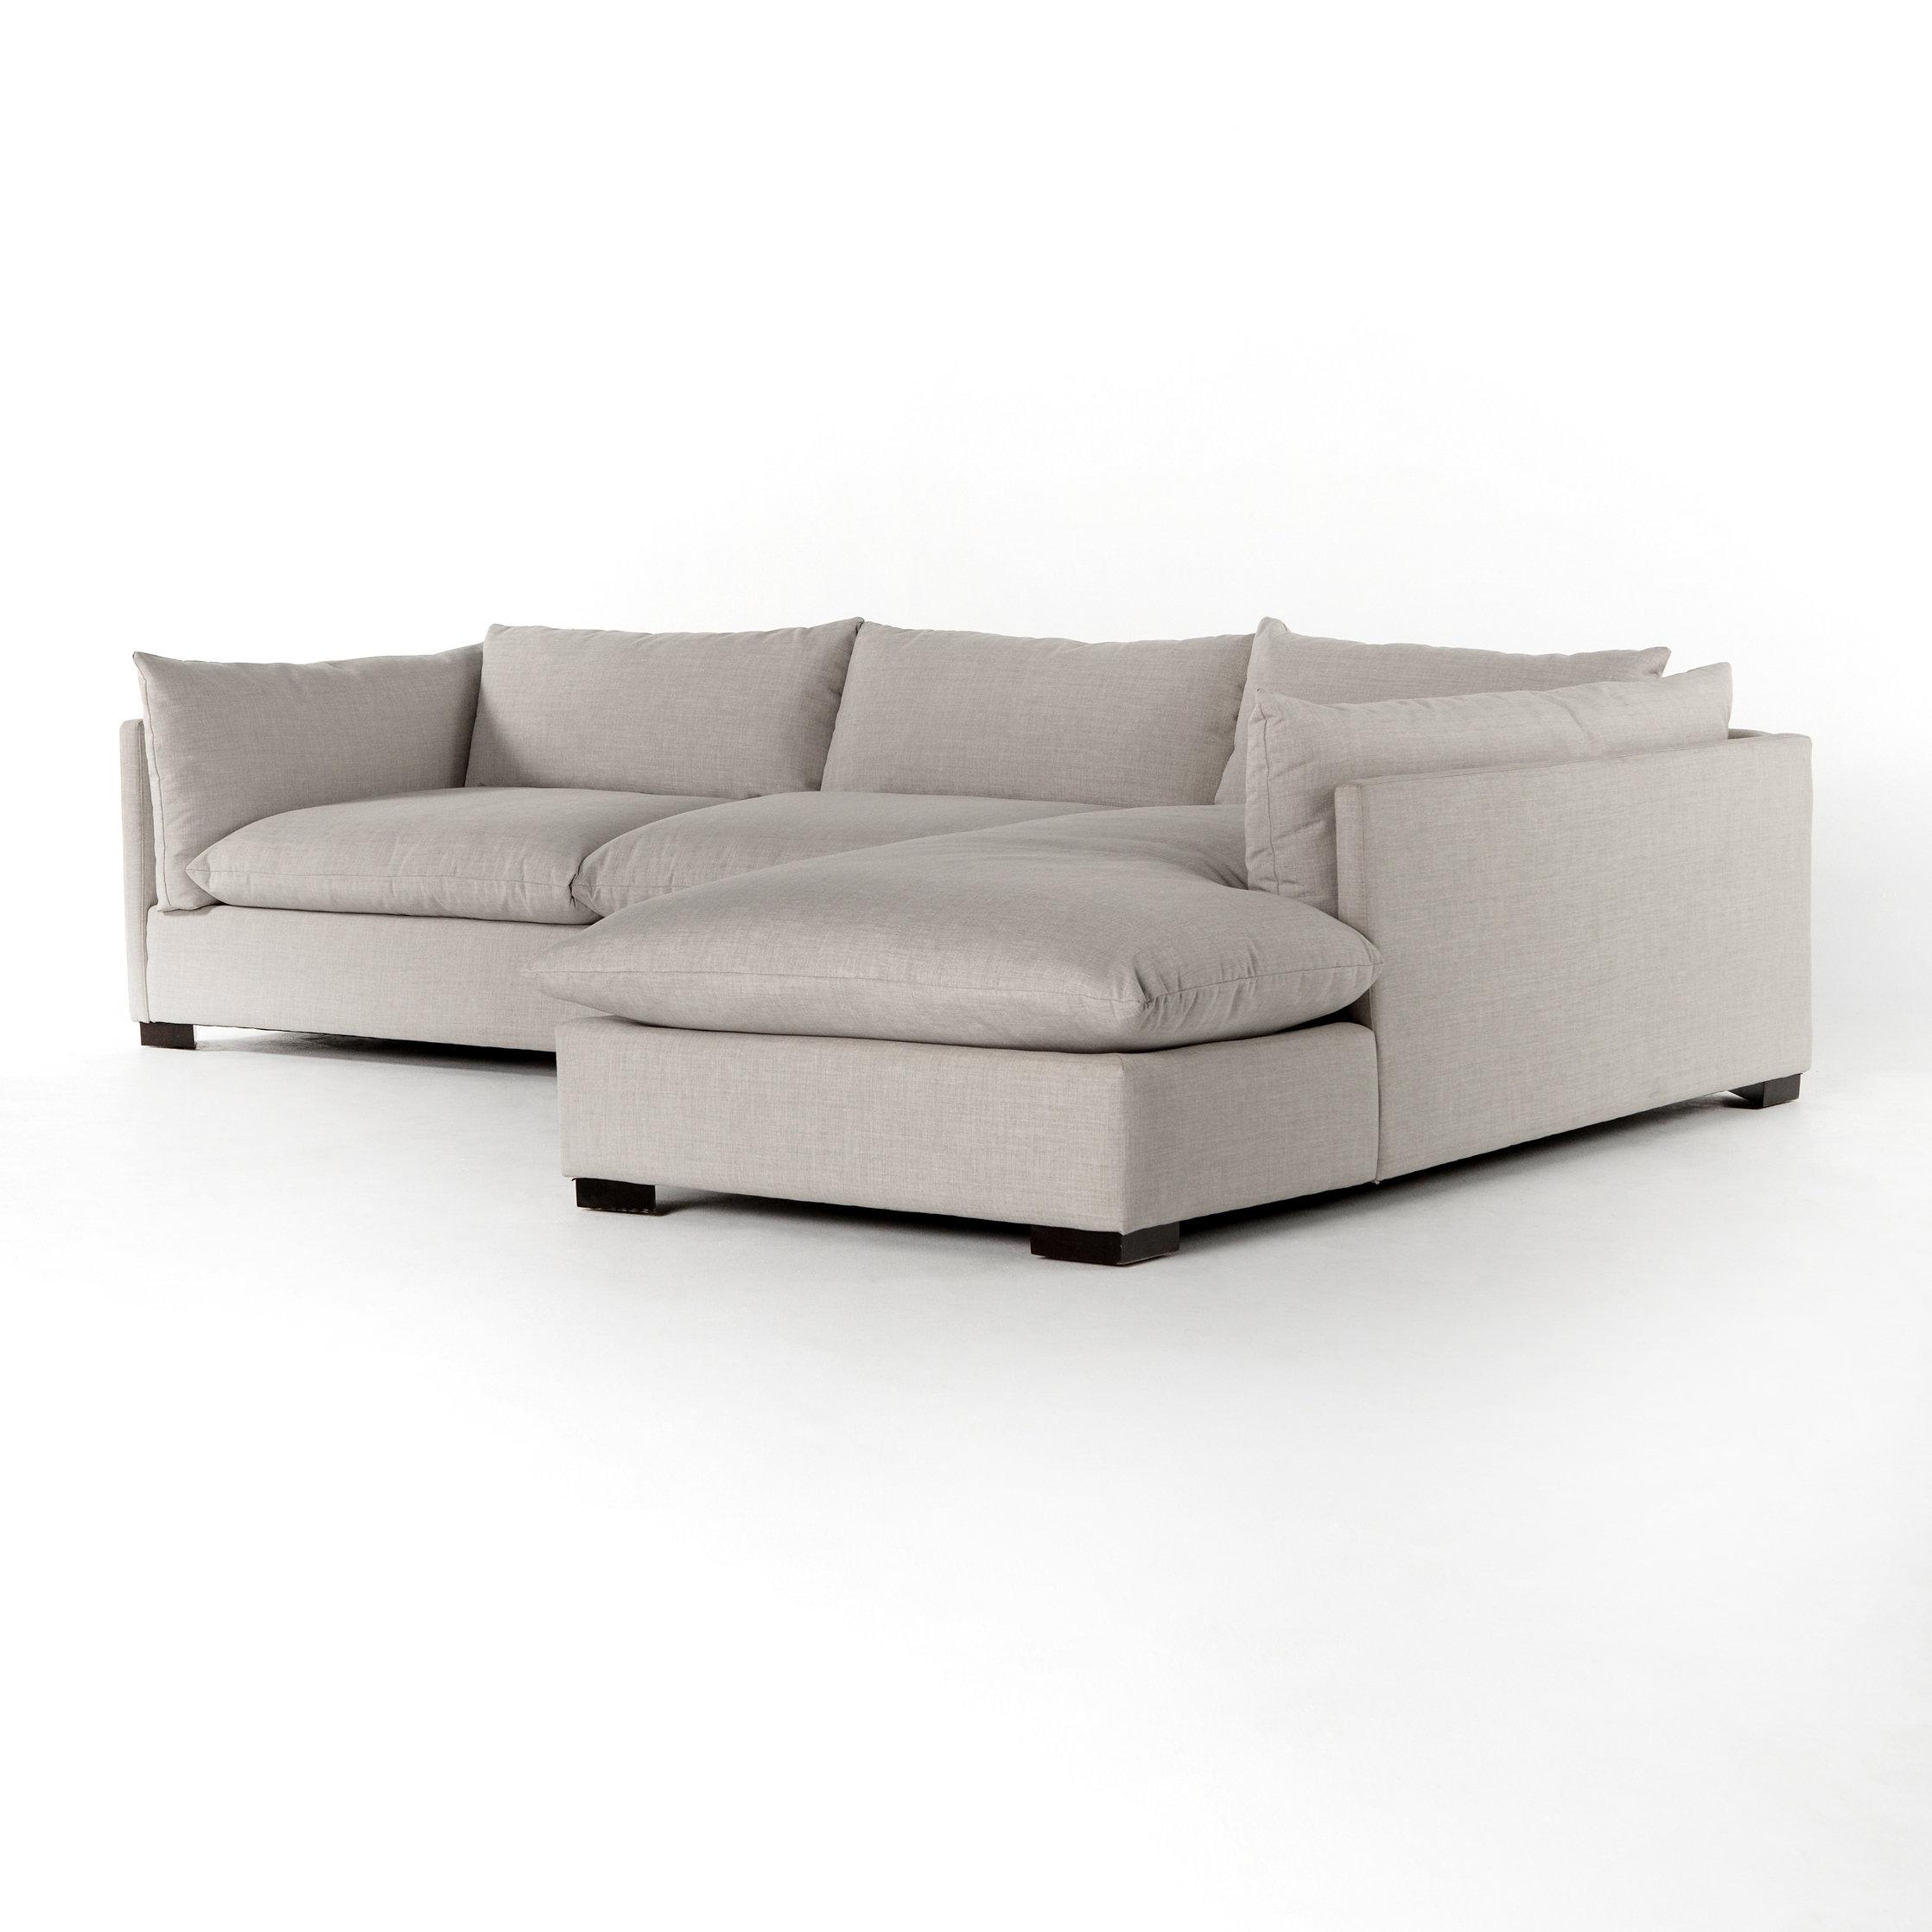 Rustic Modern Furniture Gallery